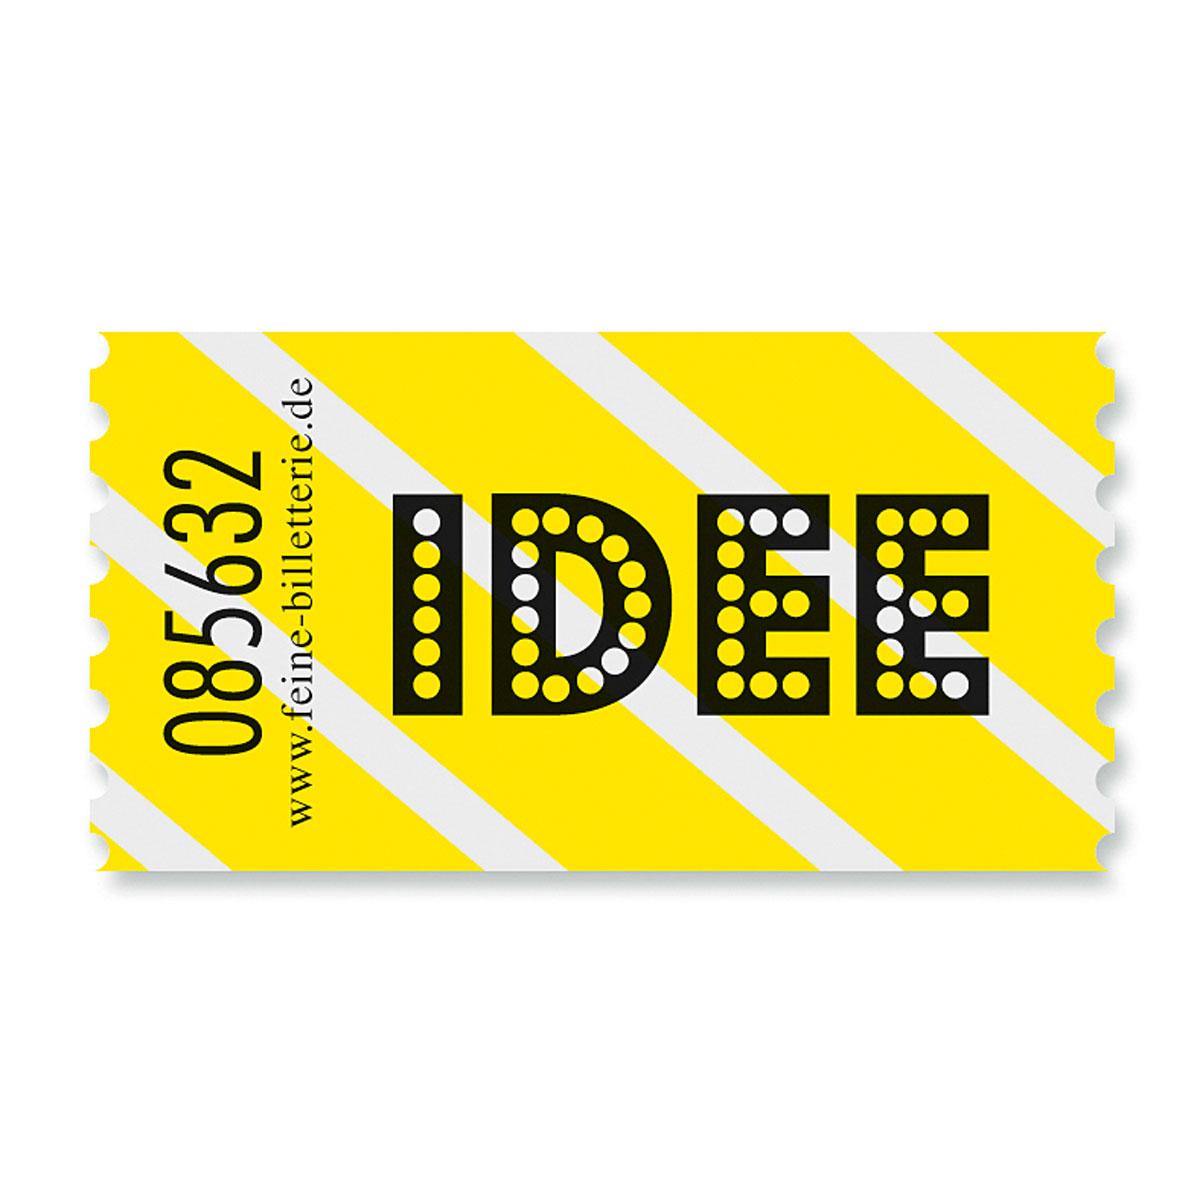 wertmarke idee kaufen corpus delicti design hamburg. Black Bedroom Furniture Sets. Home Design Ideas